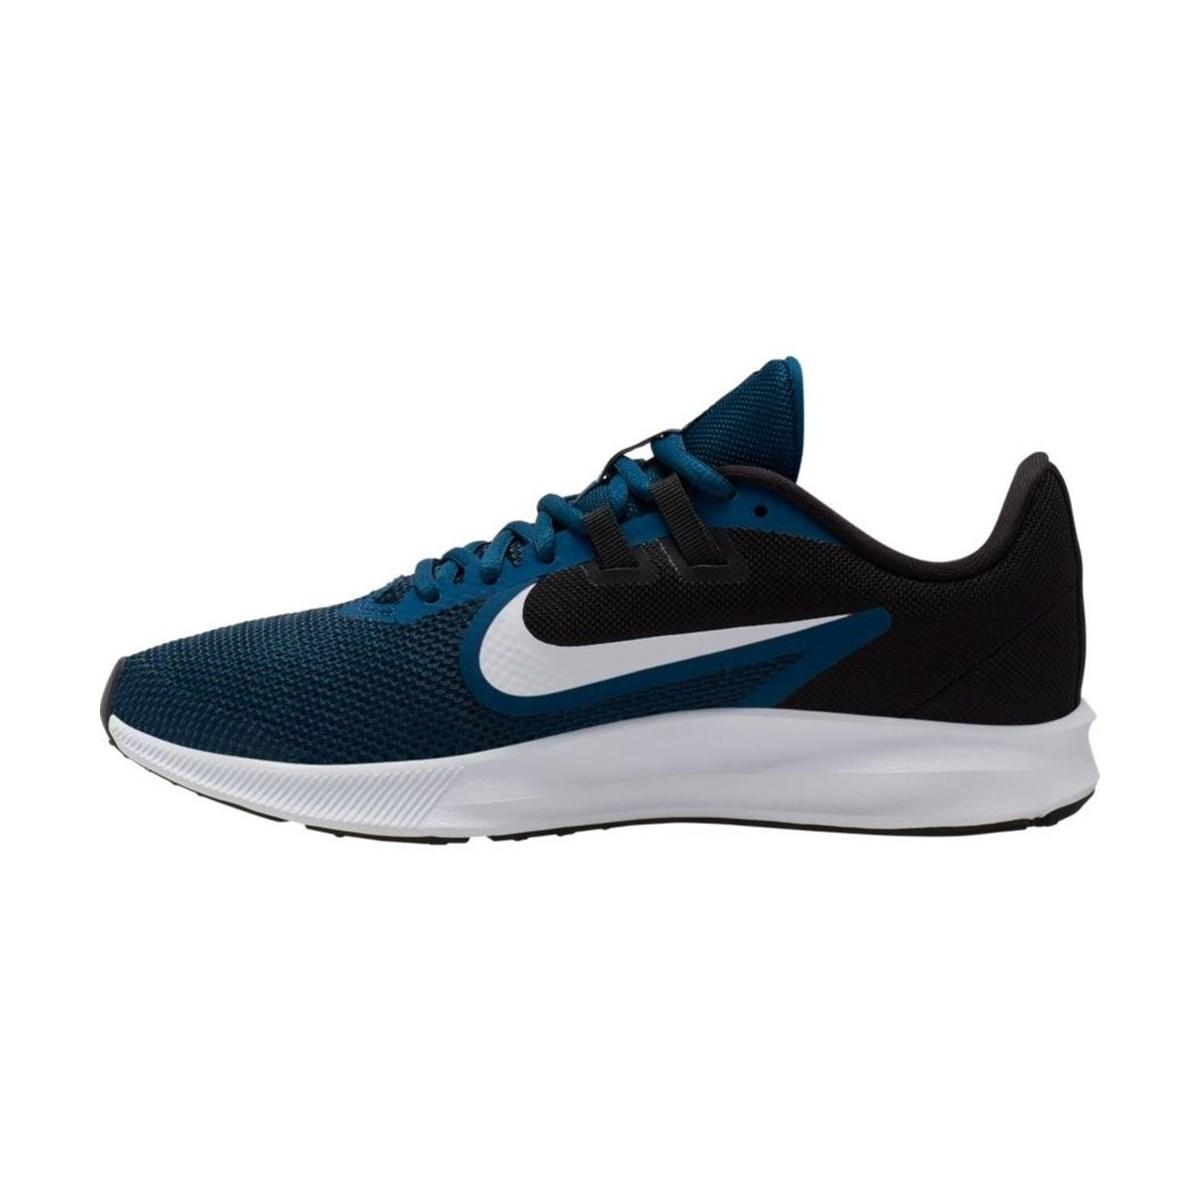 Downshifter 9 Kadın Mavi Koşu Ayakkabısı (AQ7486-400)